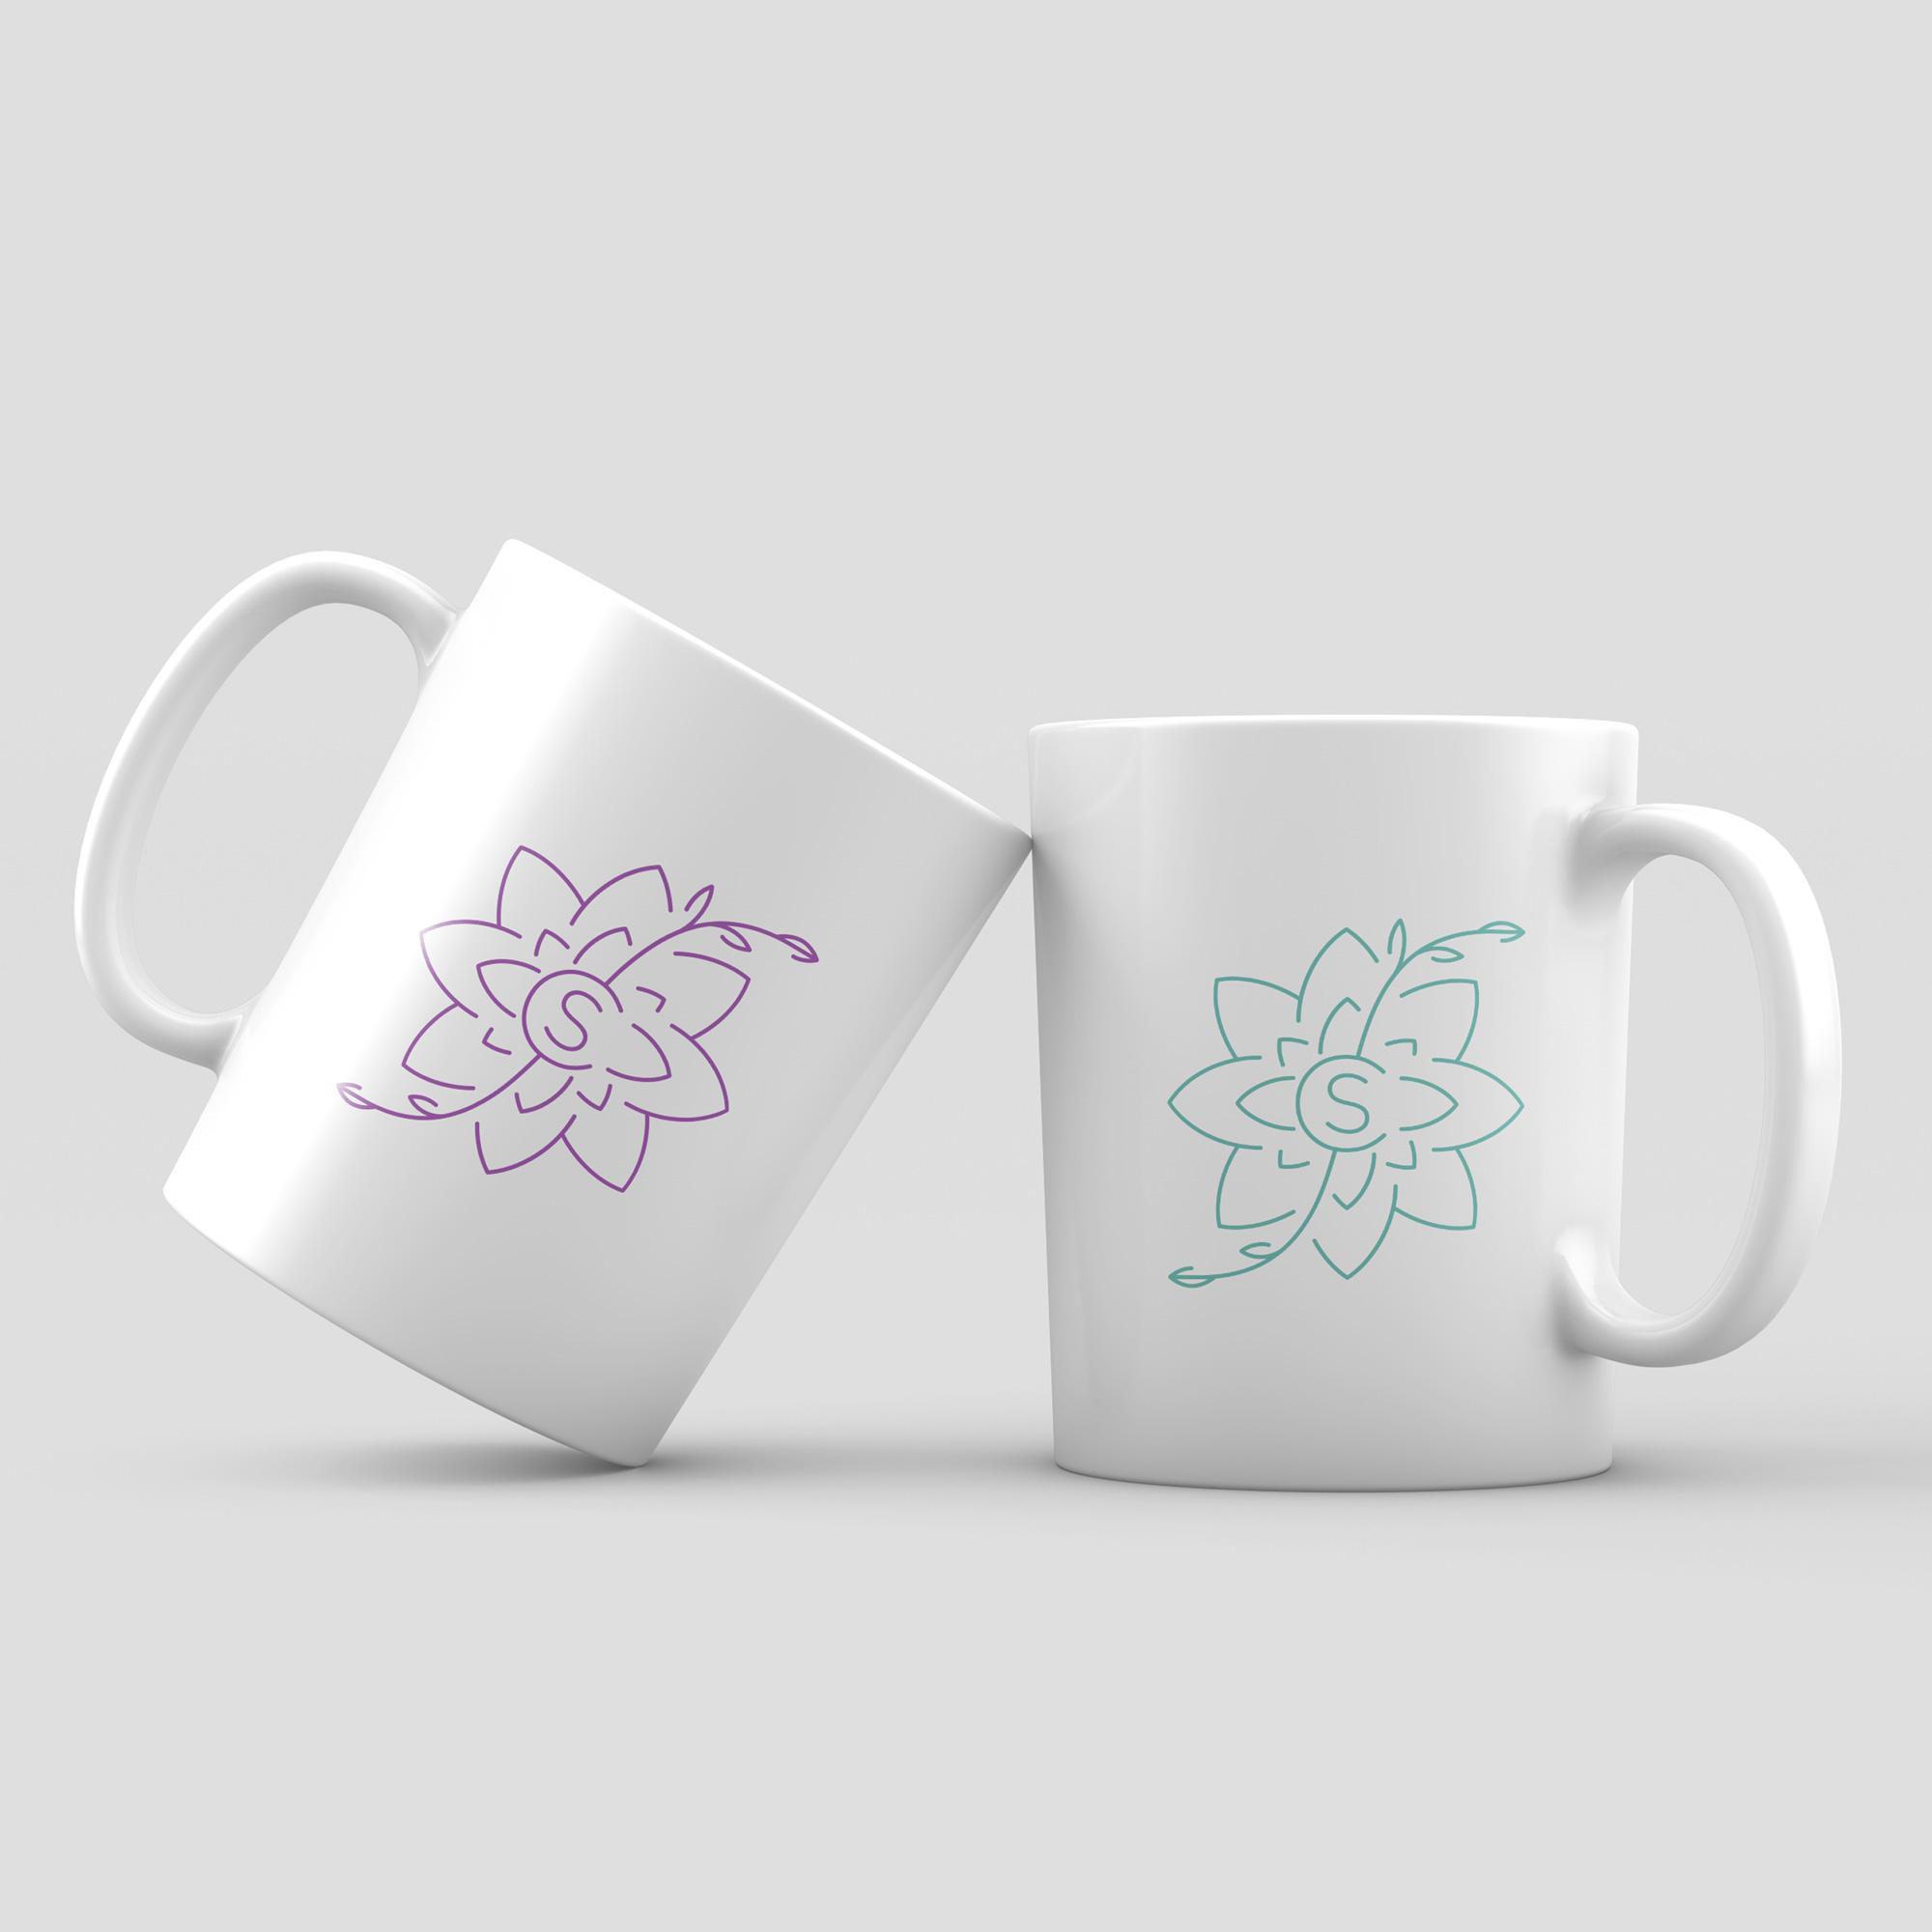 sophrocamino-mug-personnalise-graffocean-challans